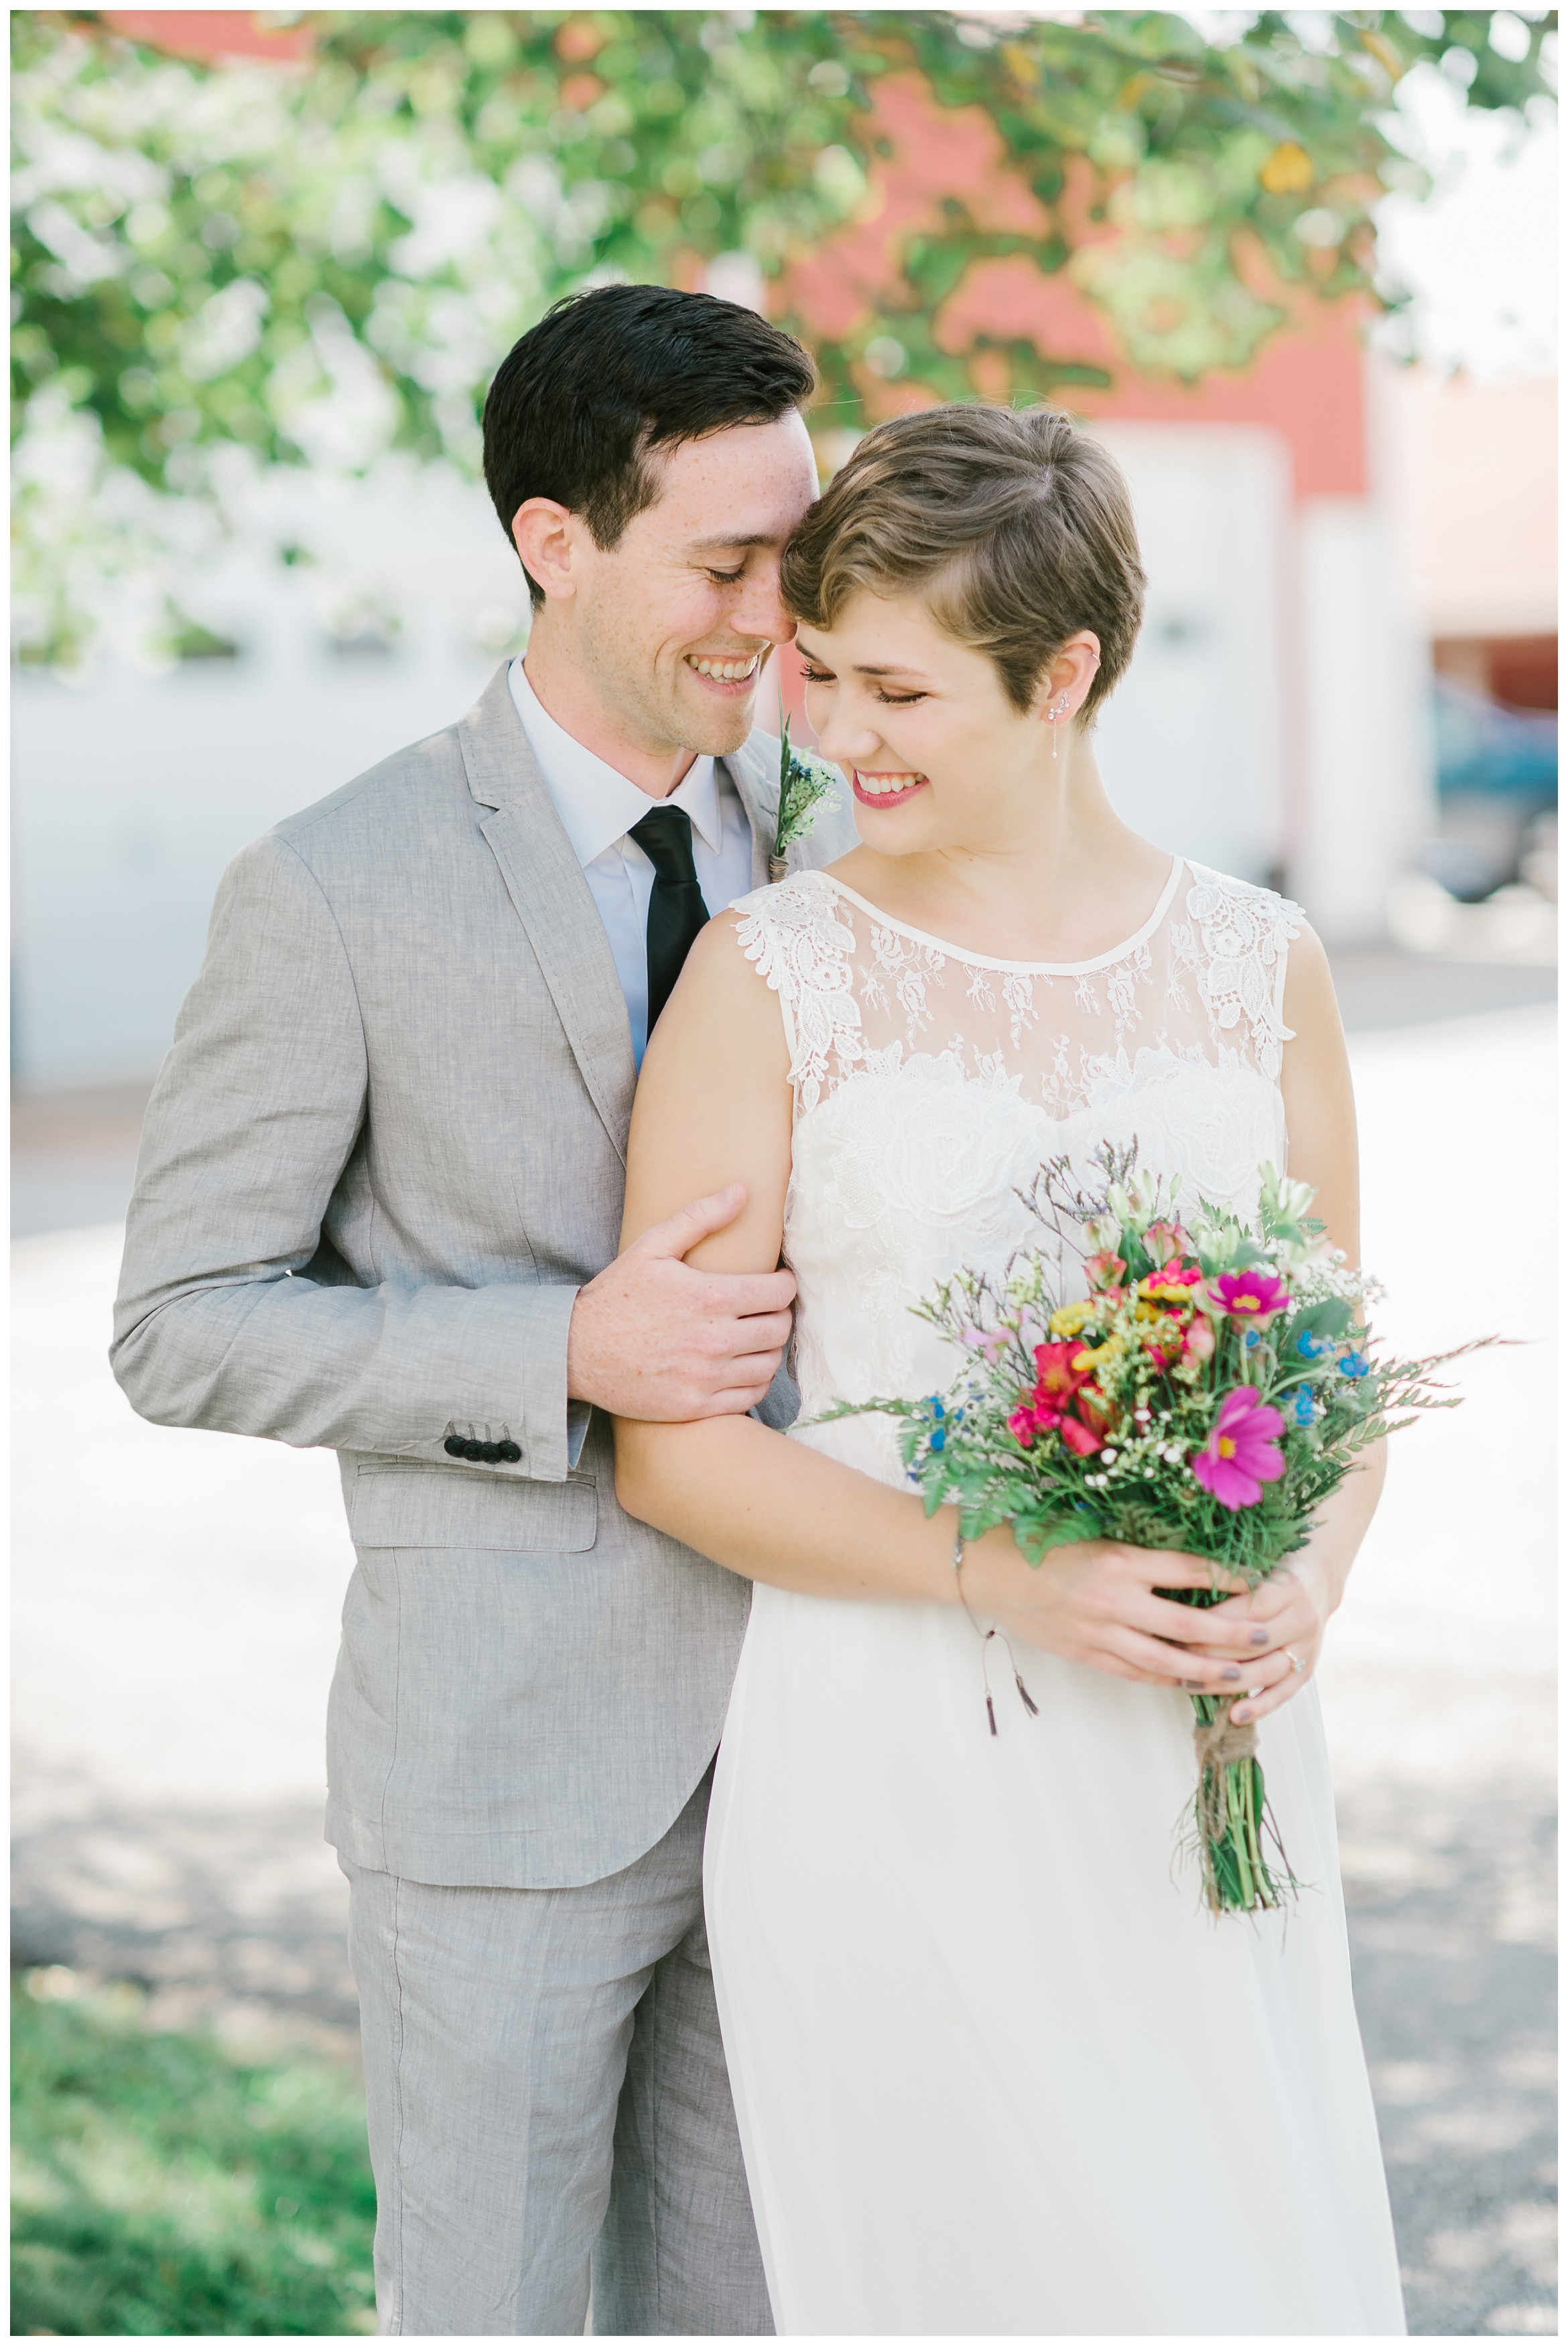 Rebecca_Shehorn_Photography_Indianapolis_Wedding_Photographer_7222.jpg